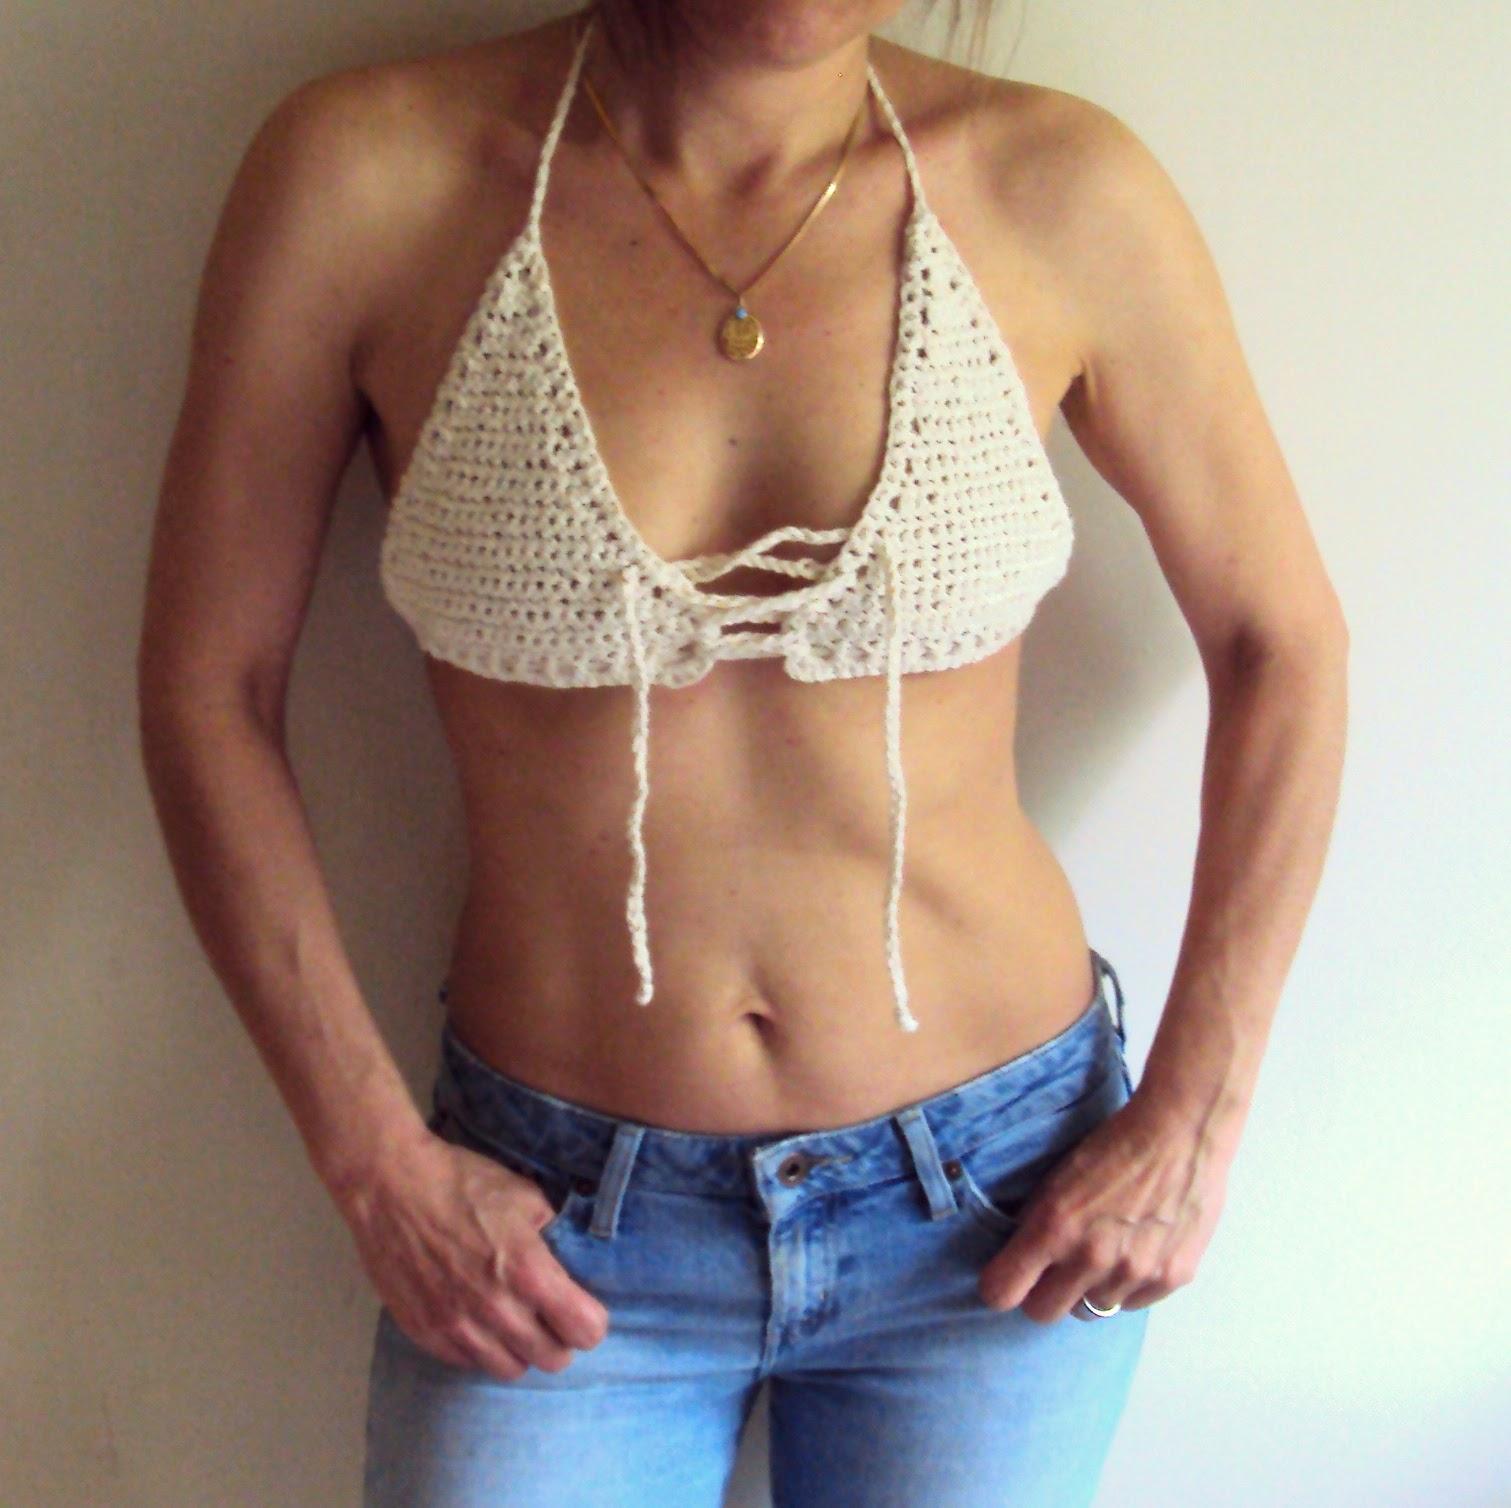 https://www.etsy.com/listing/154716920/brazilian-style-cotton-crochet-bikini?ref=shop_home_active_3